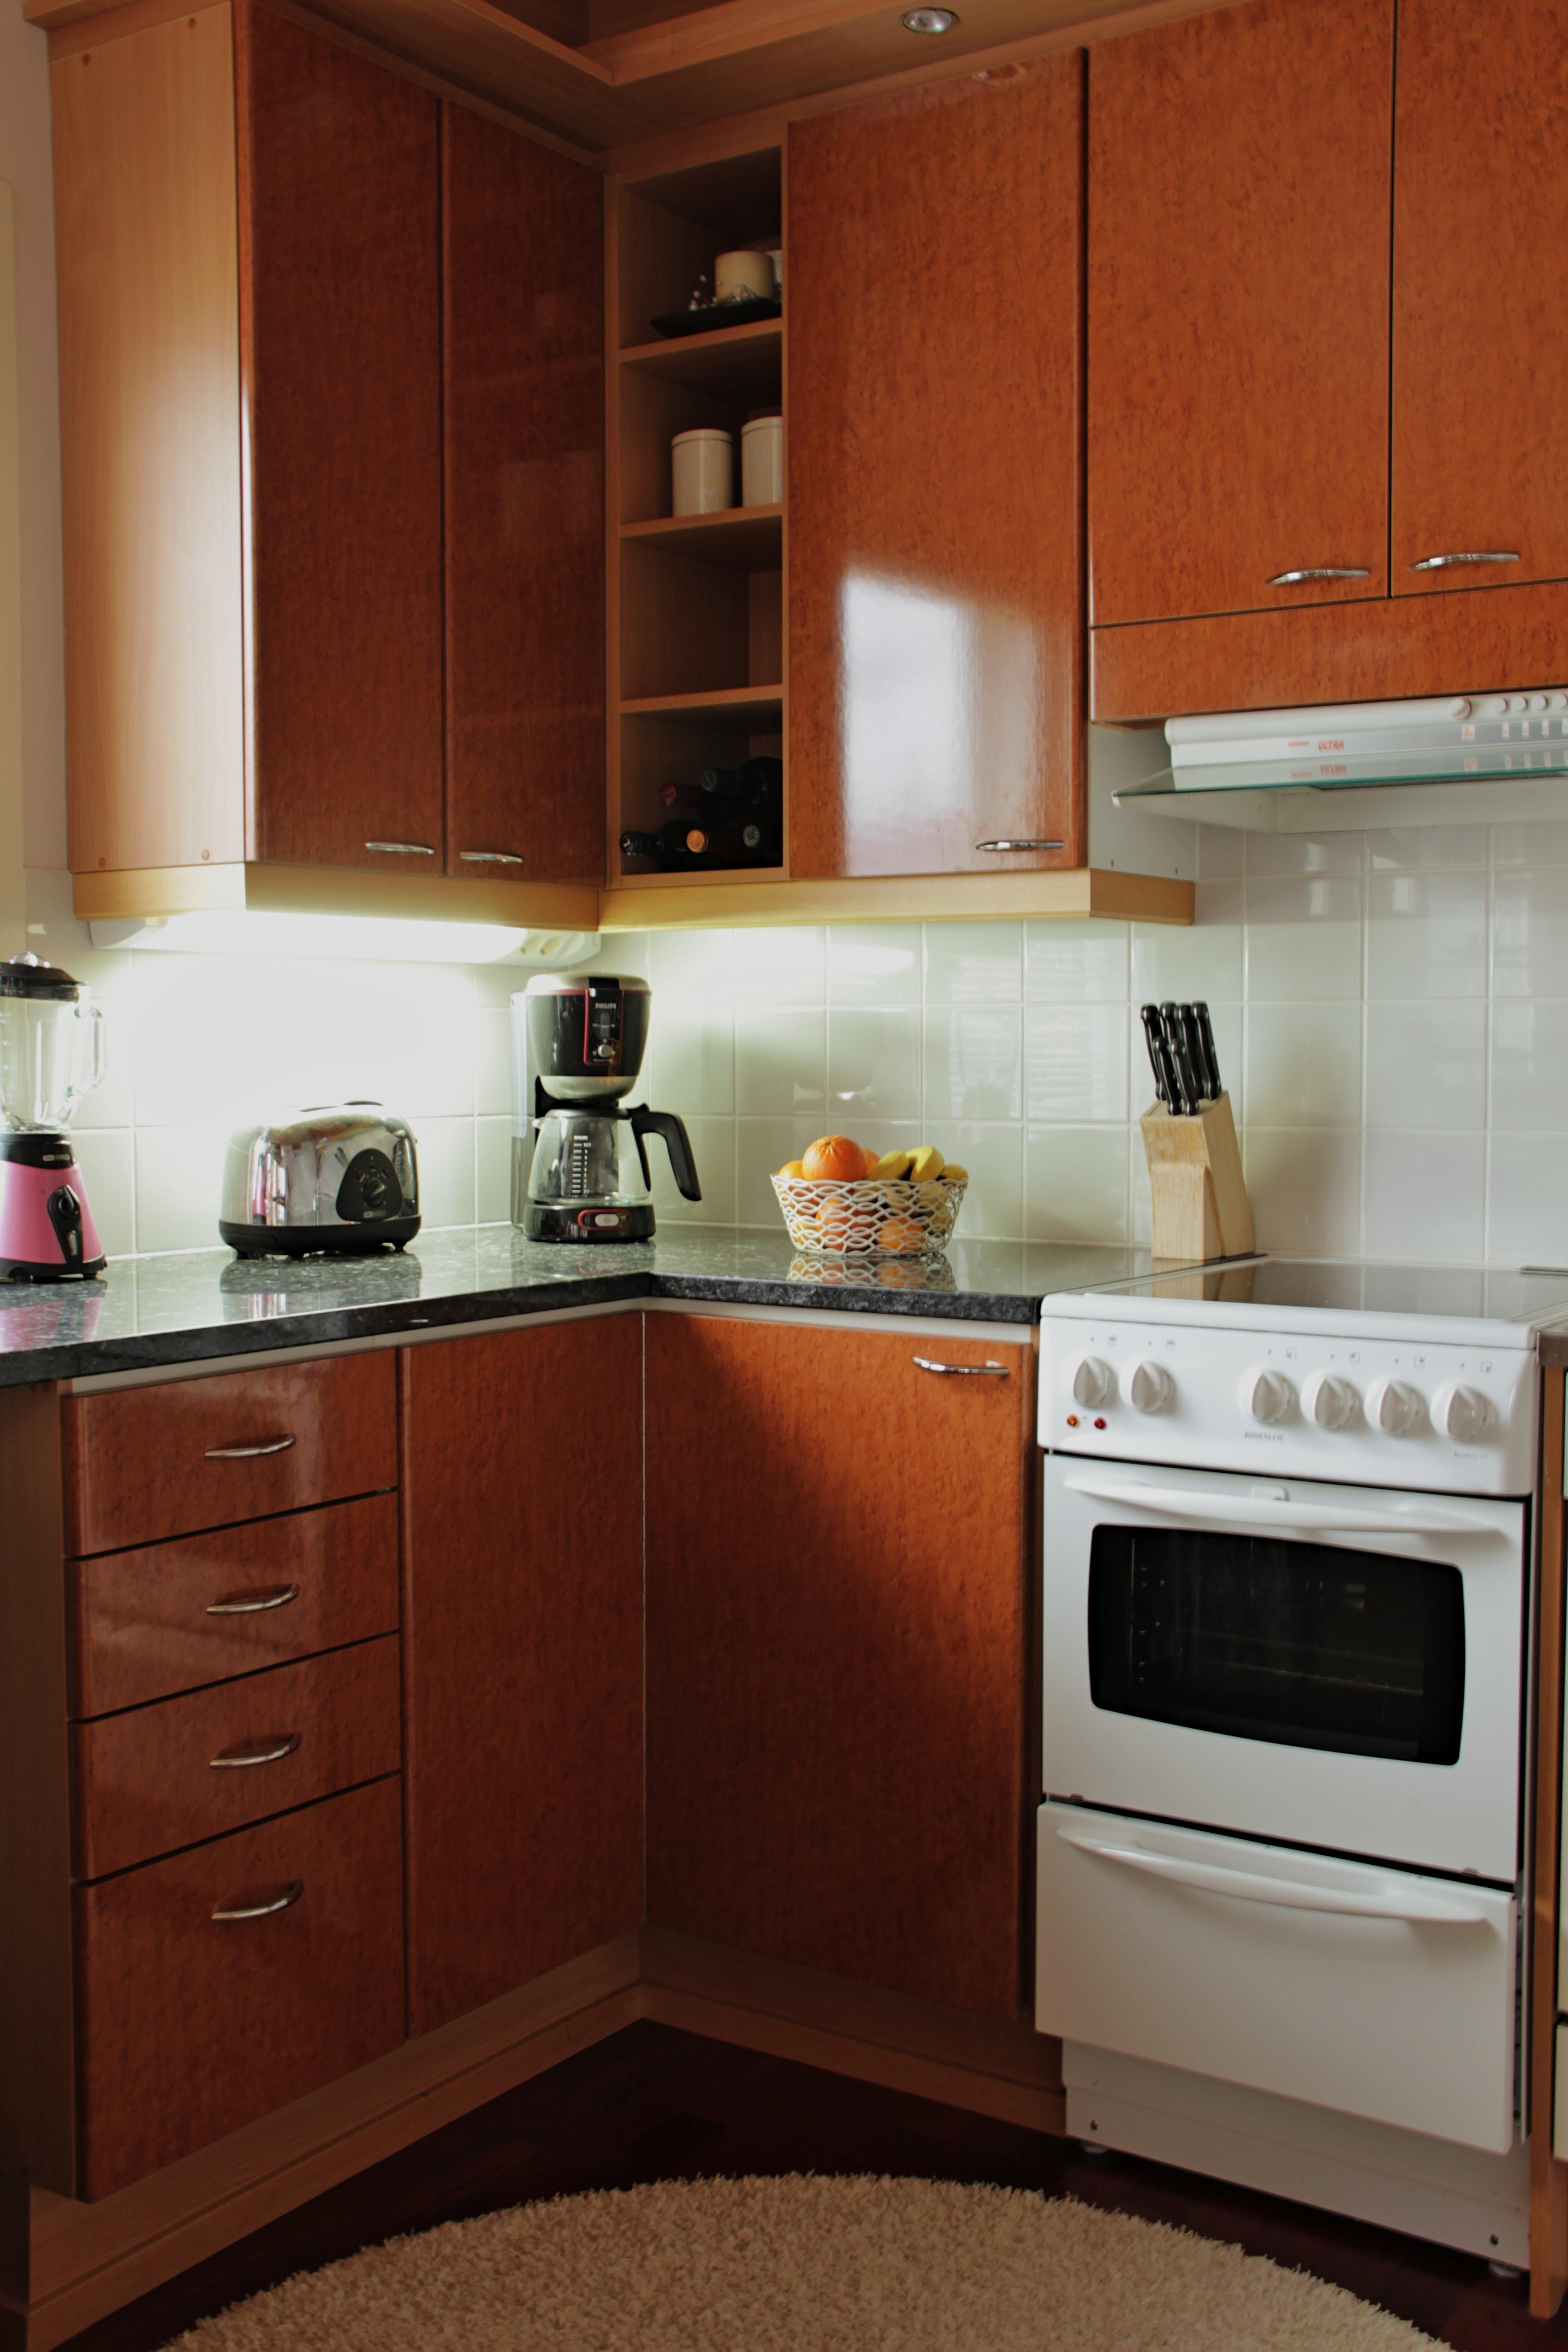 Kayu Lantai Rumah Makanan Pondok Dapur R Apartemen Masakan Alat Masak Meja Kompor Desain Interior Sudut